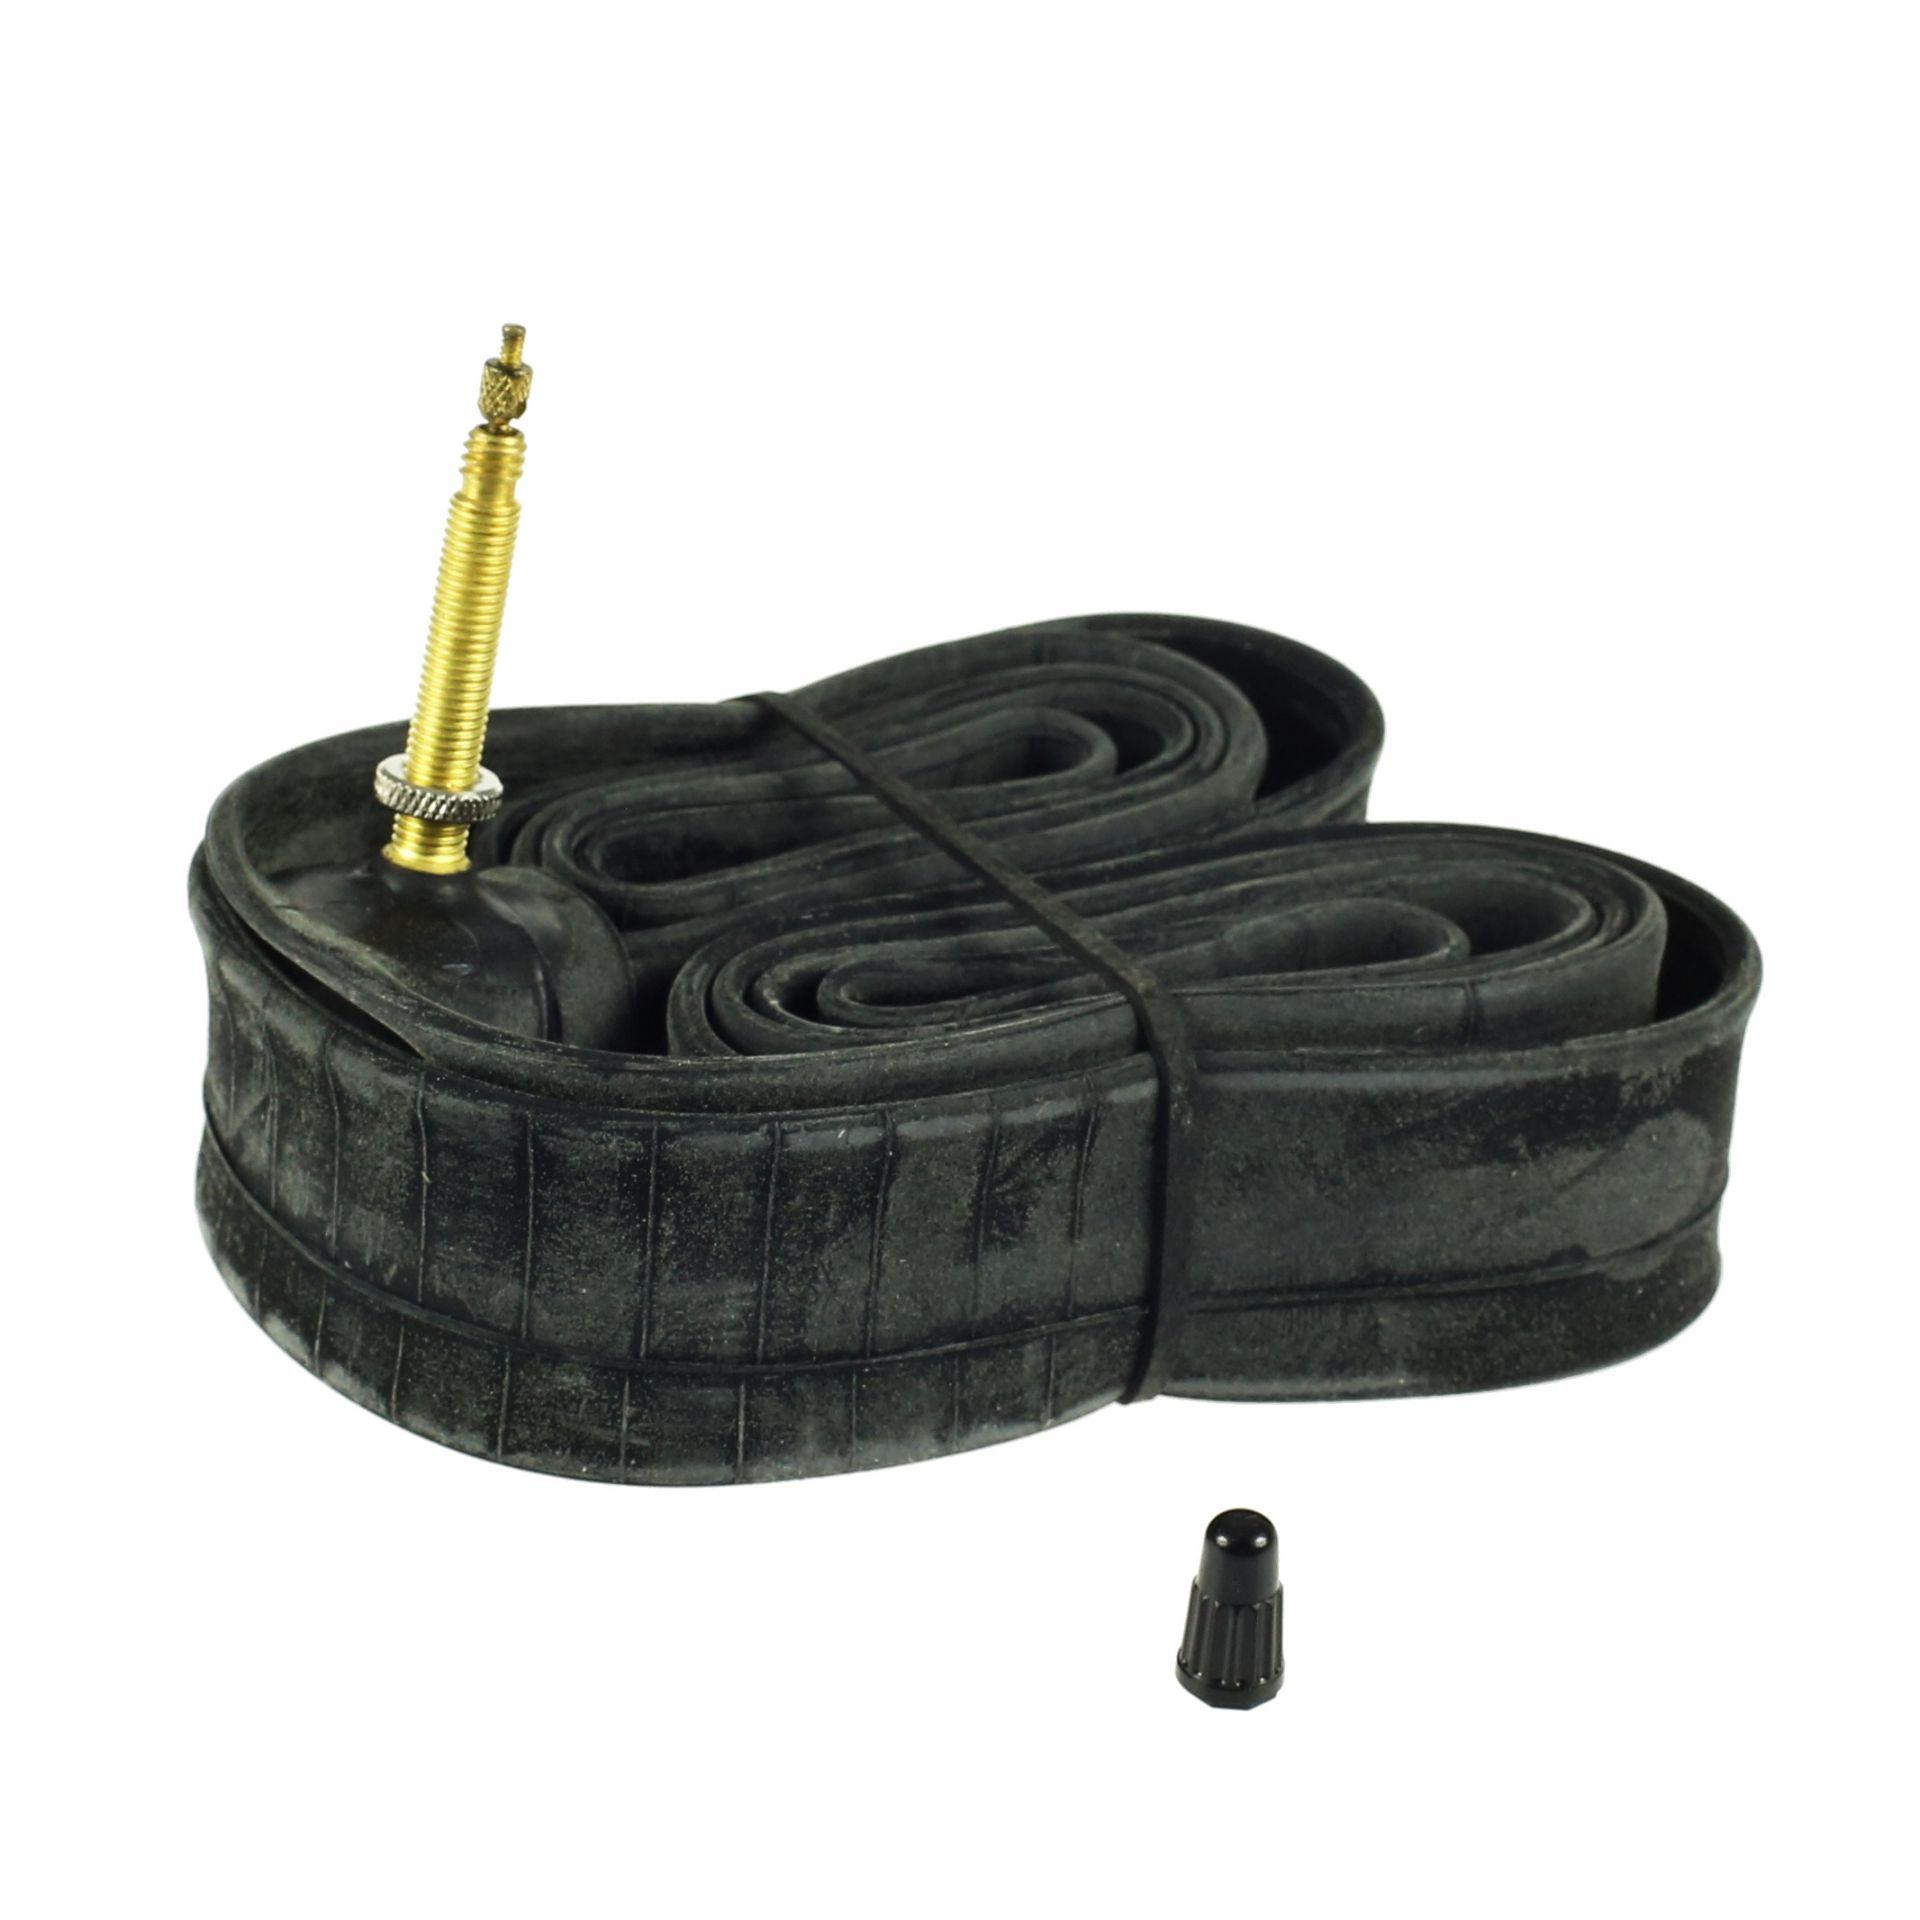 Chambre à air Michelin 26x1.10/1.50 Presta 40 mm